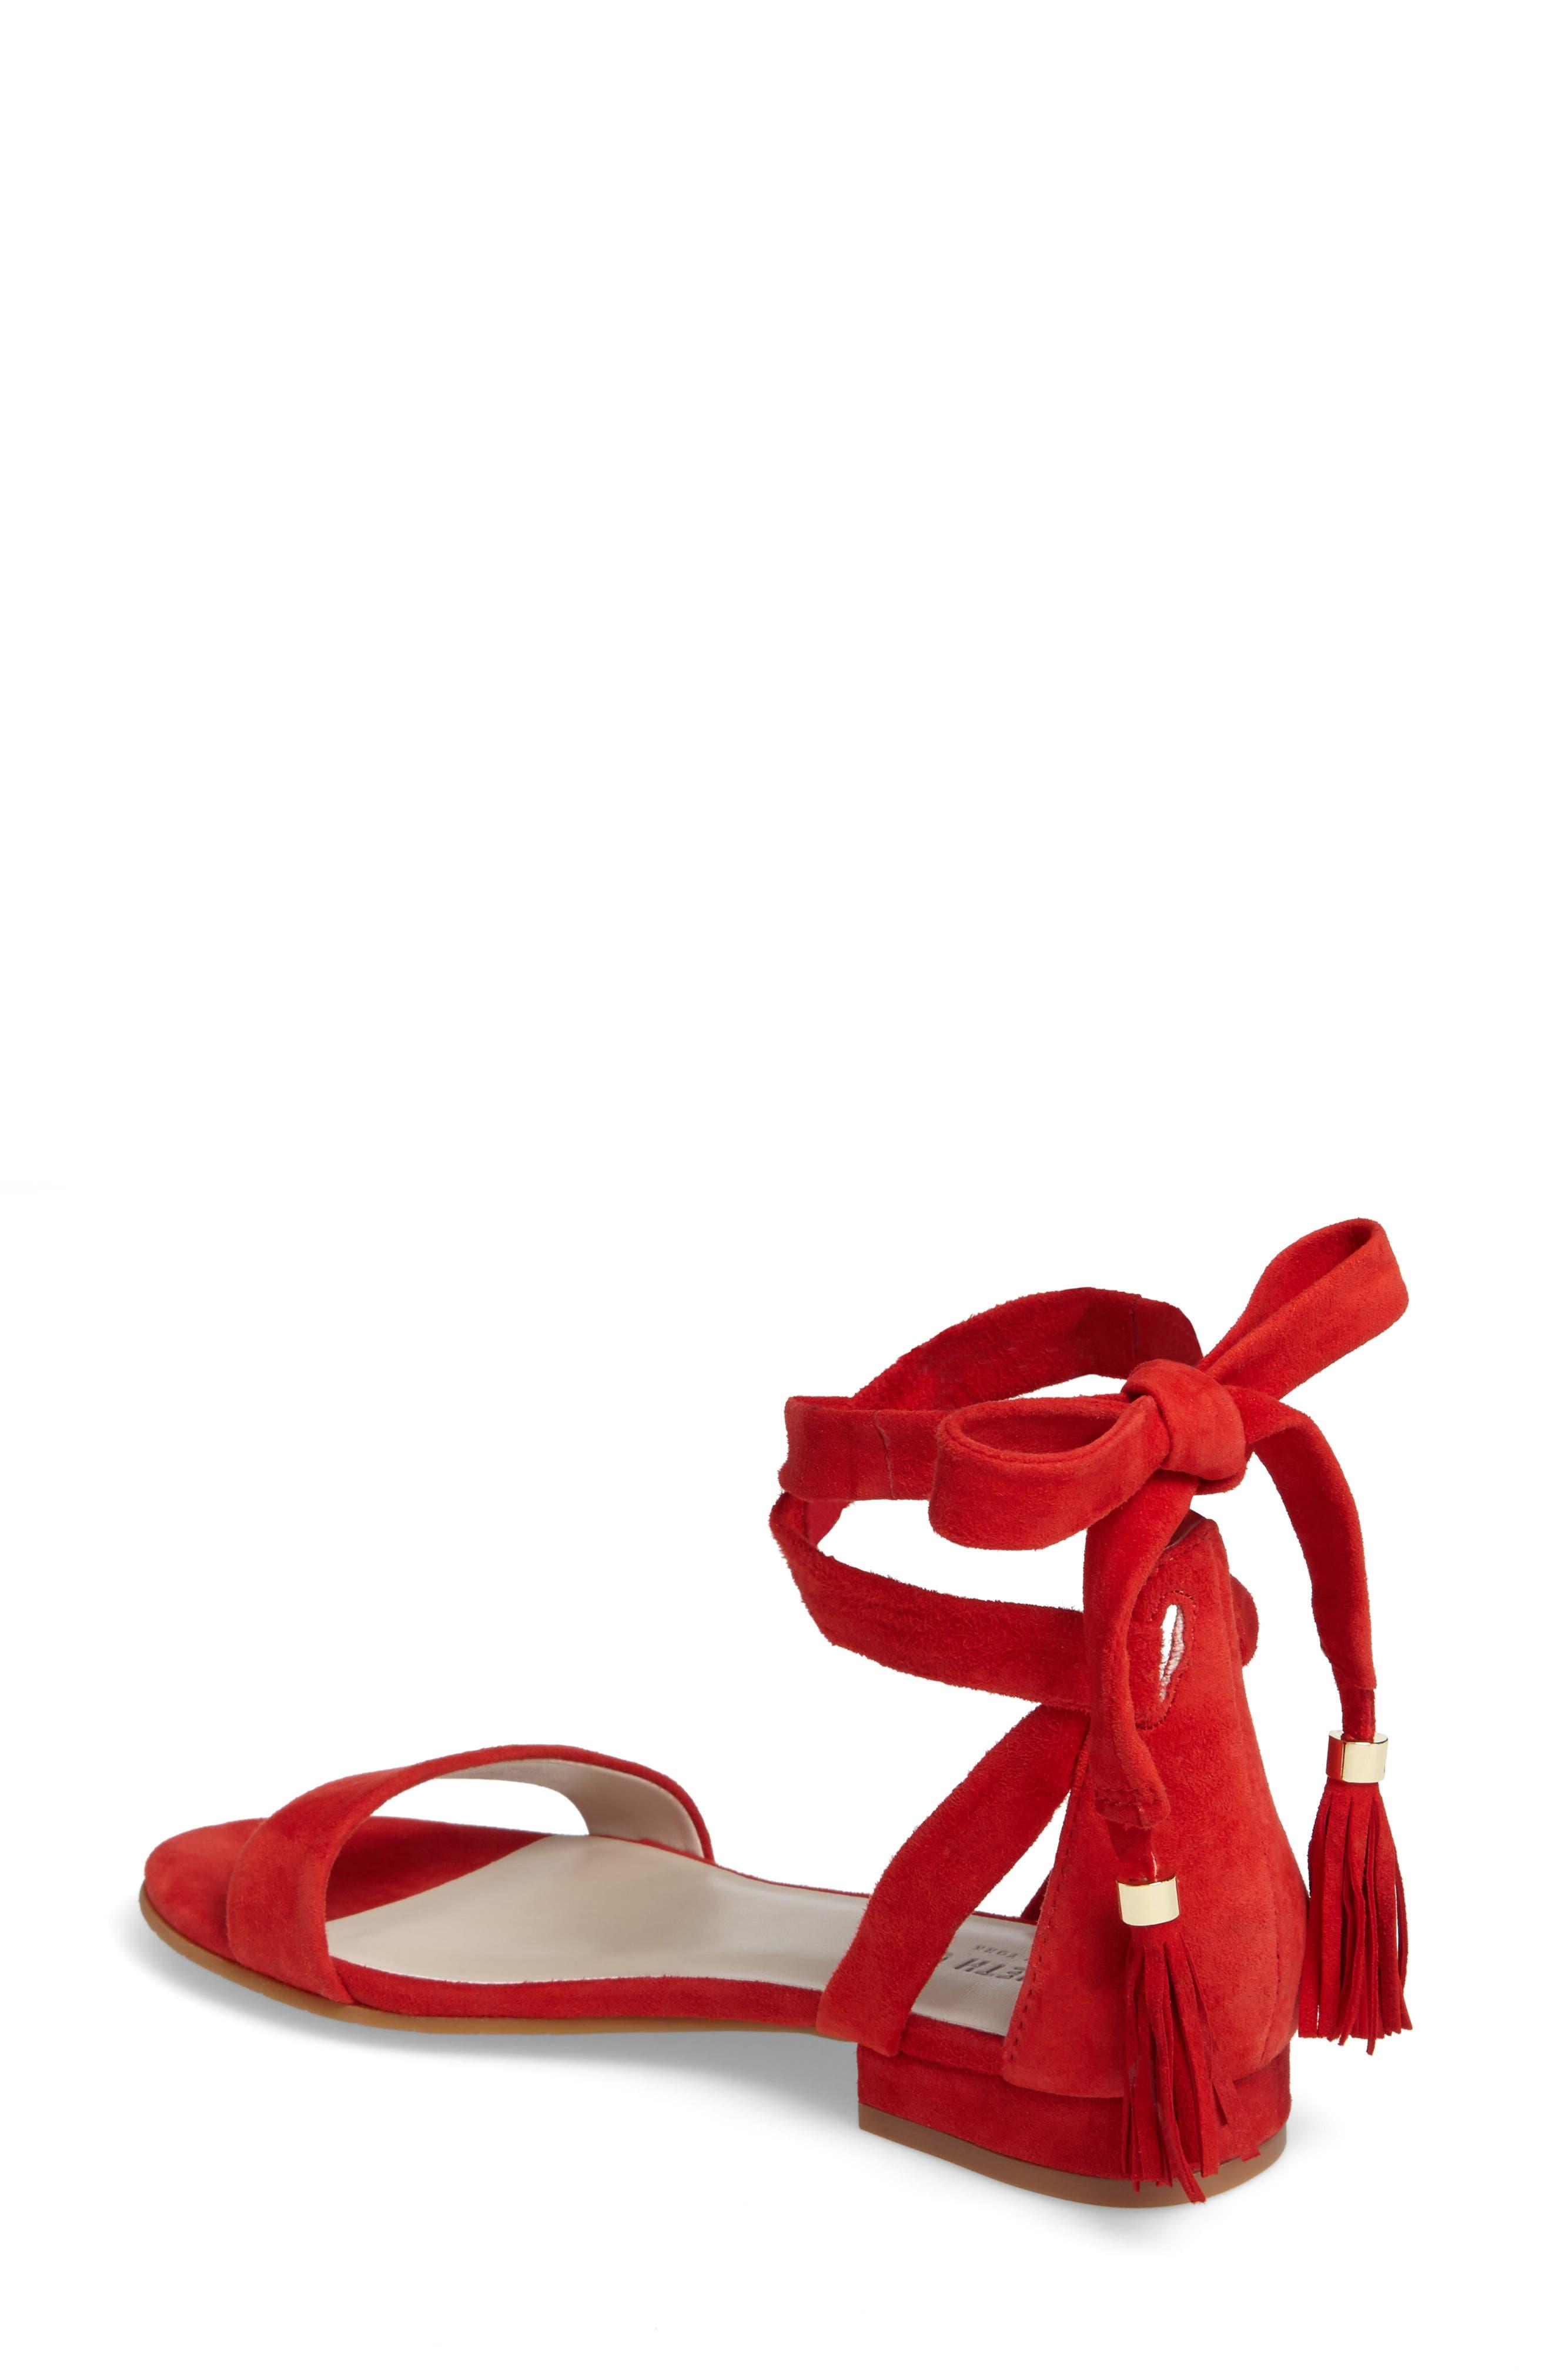 Valen Tassel Lace-Up Sandal,                             Alternate thumbnail 25, color,